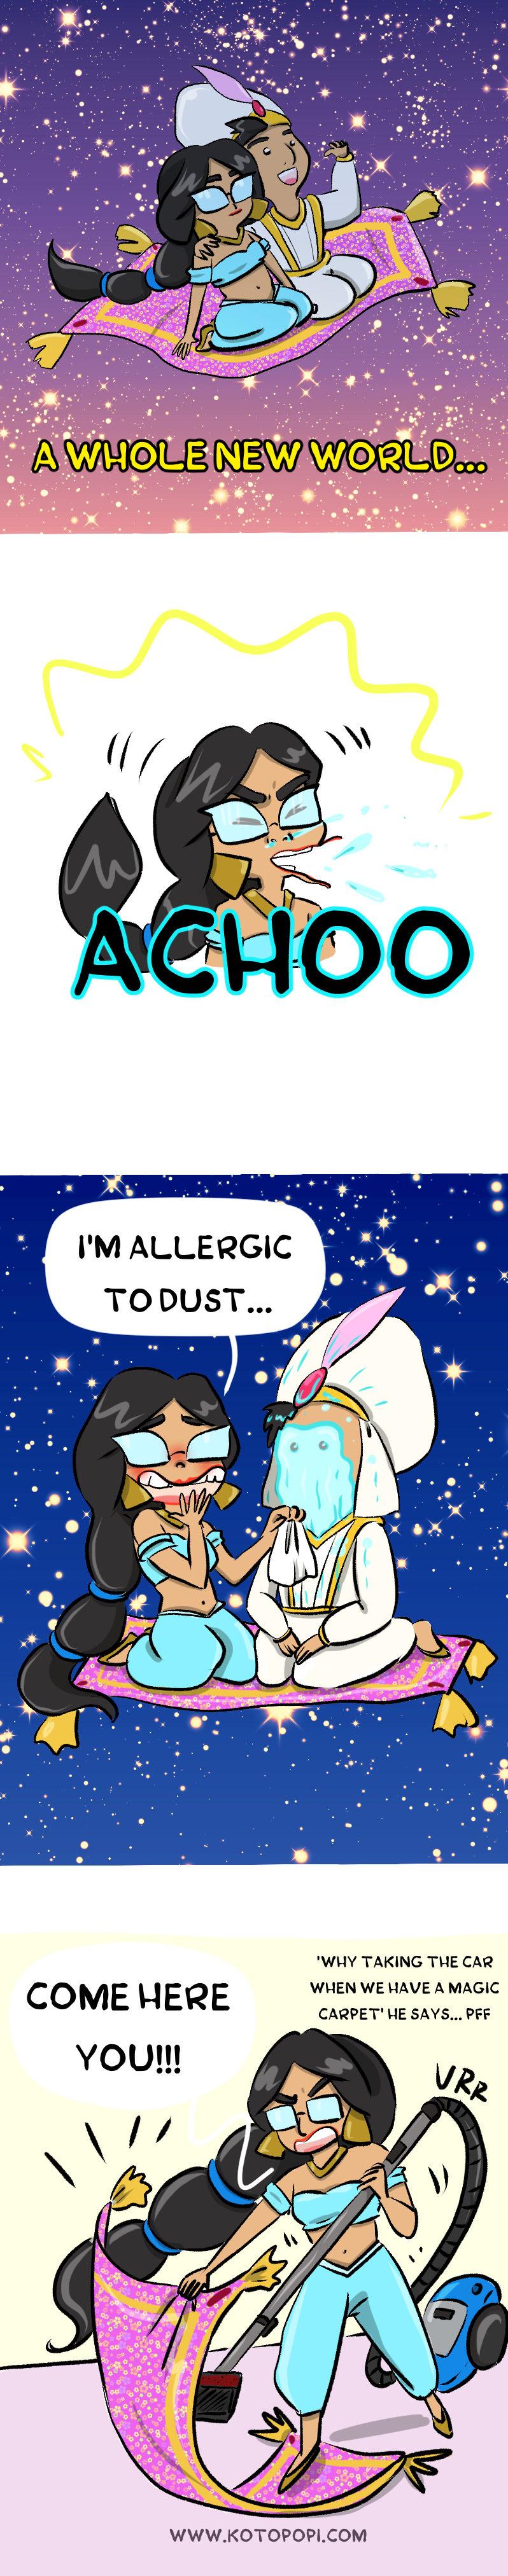 funny meme about disney princess jasmine aladdin